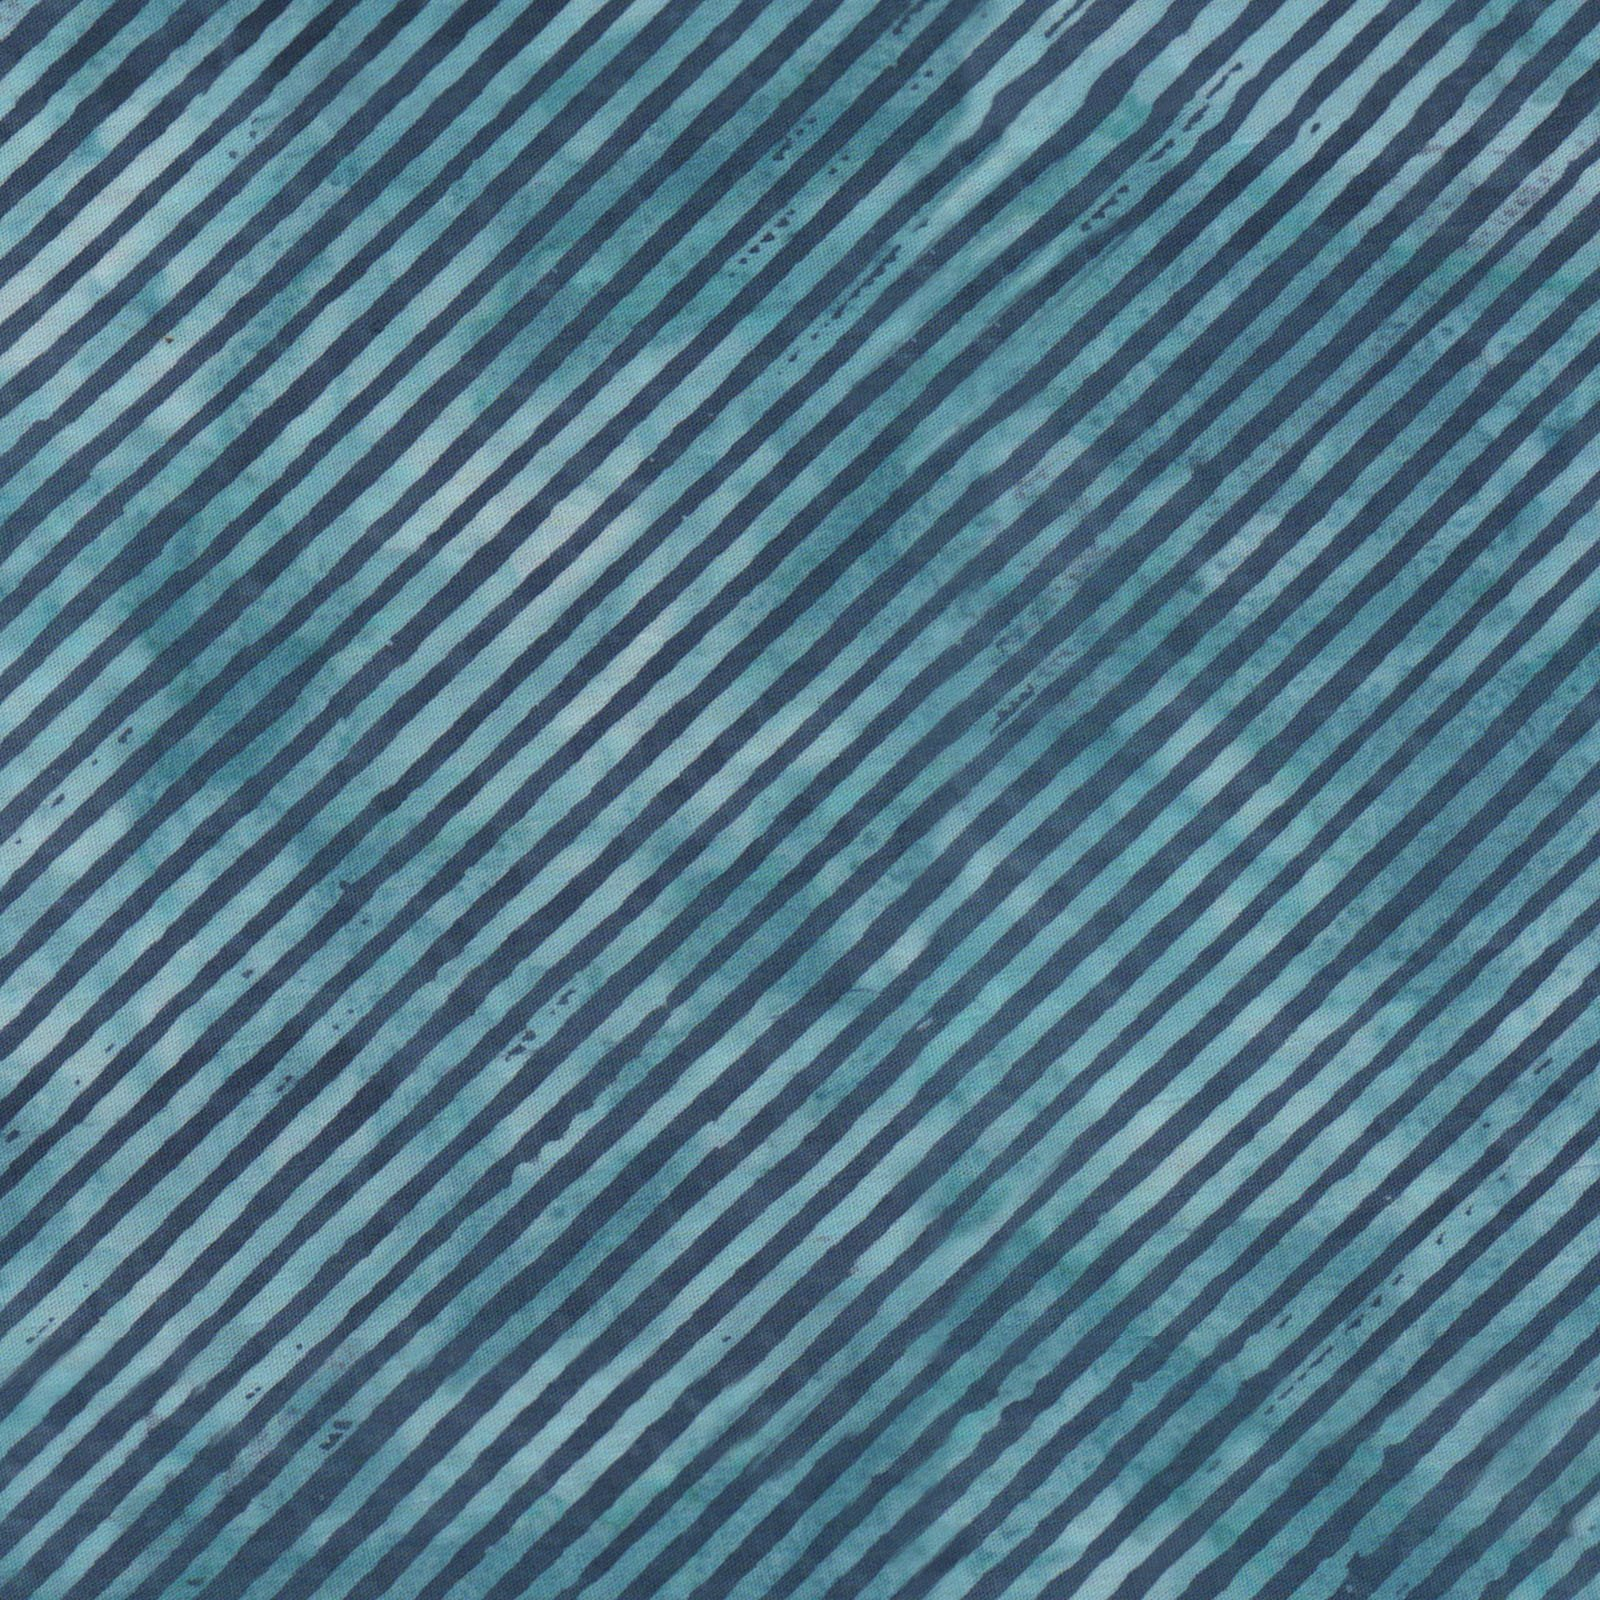 EESC-B50 QB - COLOR THERAPY BATIKS BY MAYWOOD STUDIO BIAS STRIPE TEAL/BLUE - ARRIVING DECEMBER 2020